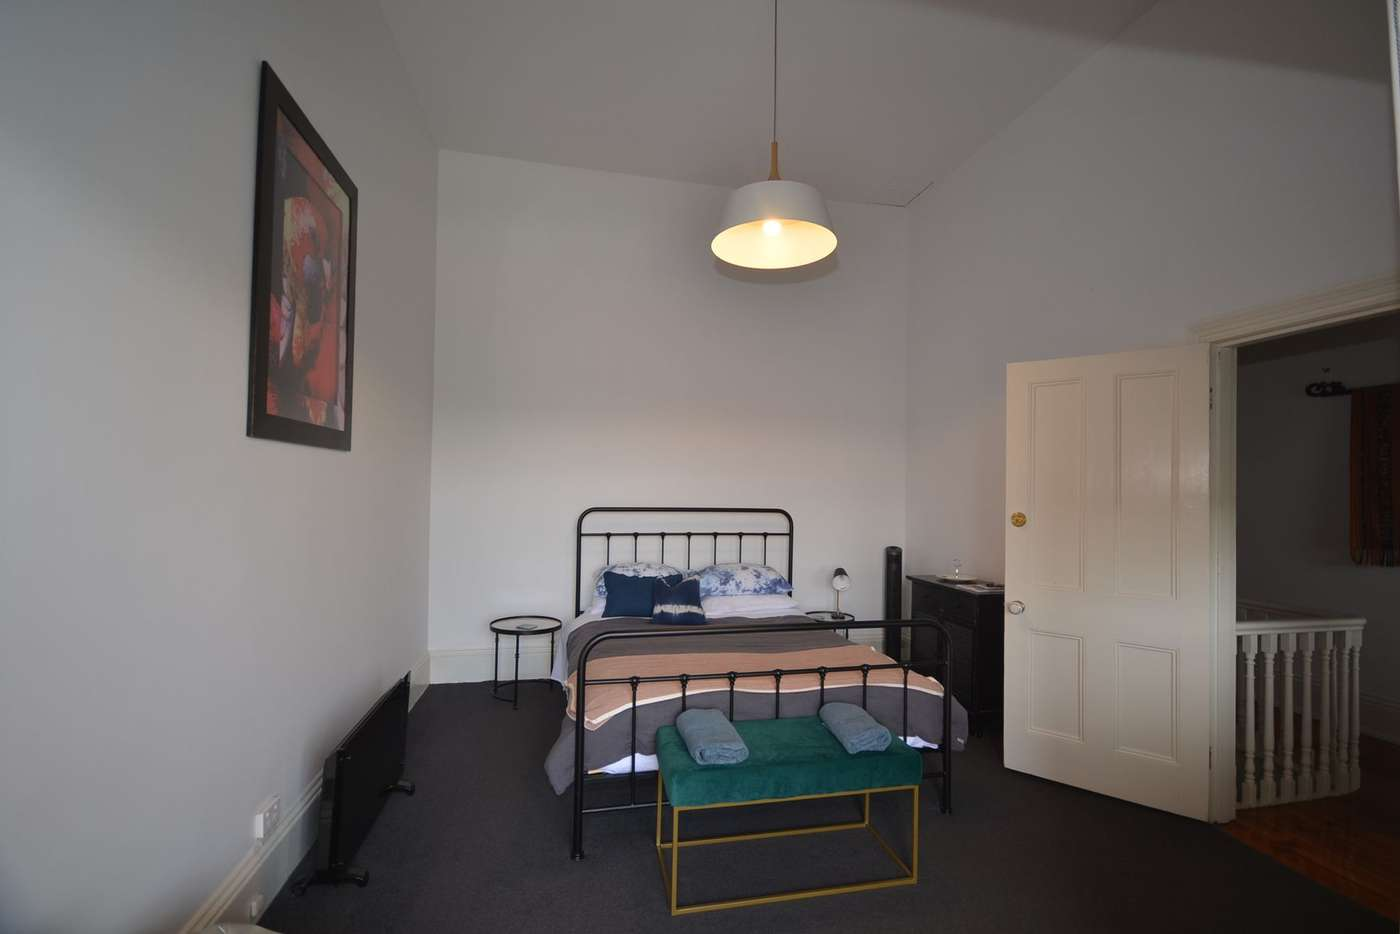 Seventh view of Homely house listing, 35 Mackenzie Street, Bendigo VIC 3550